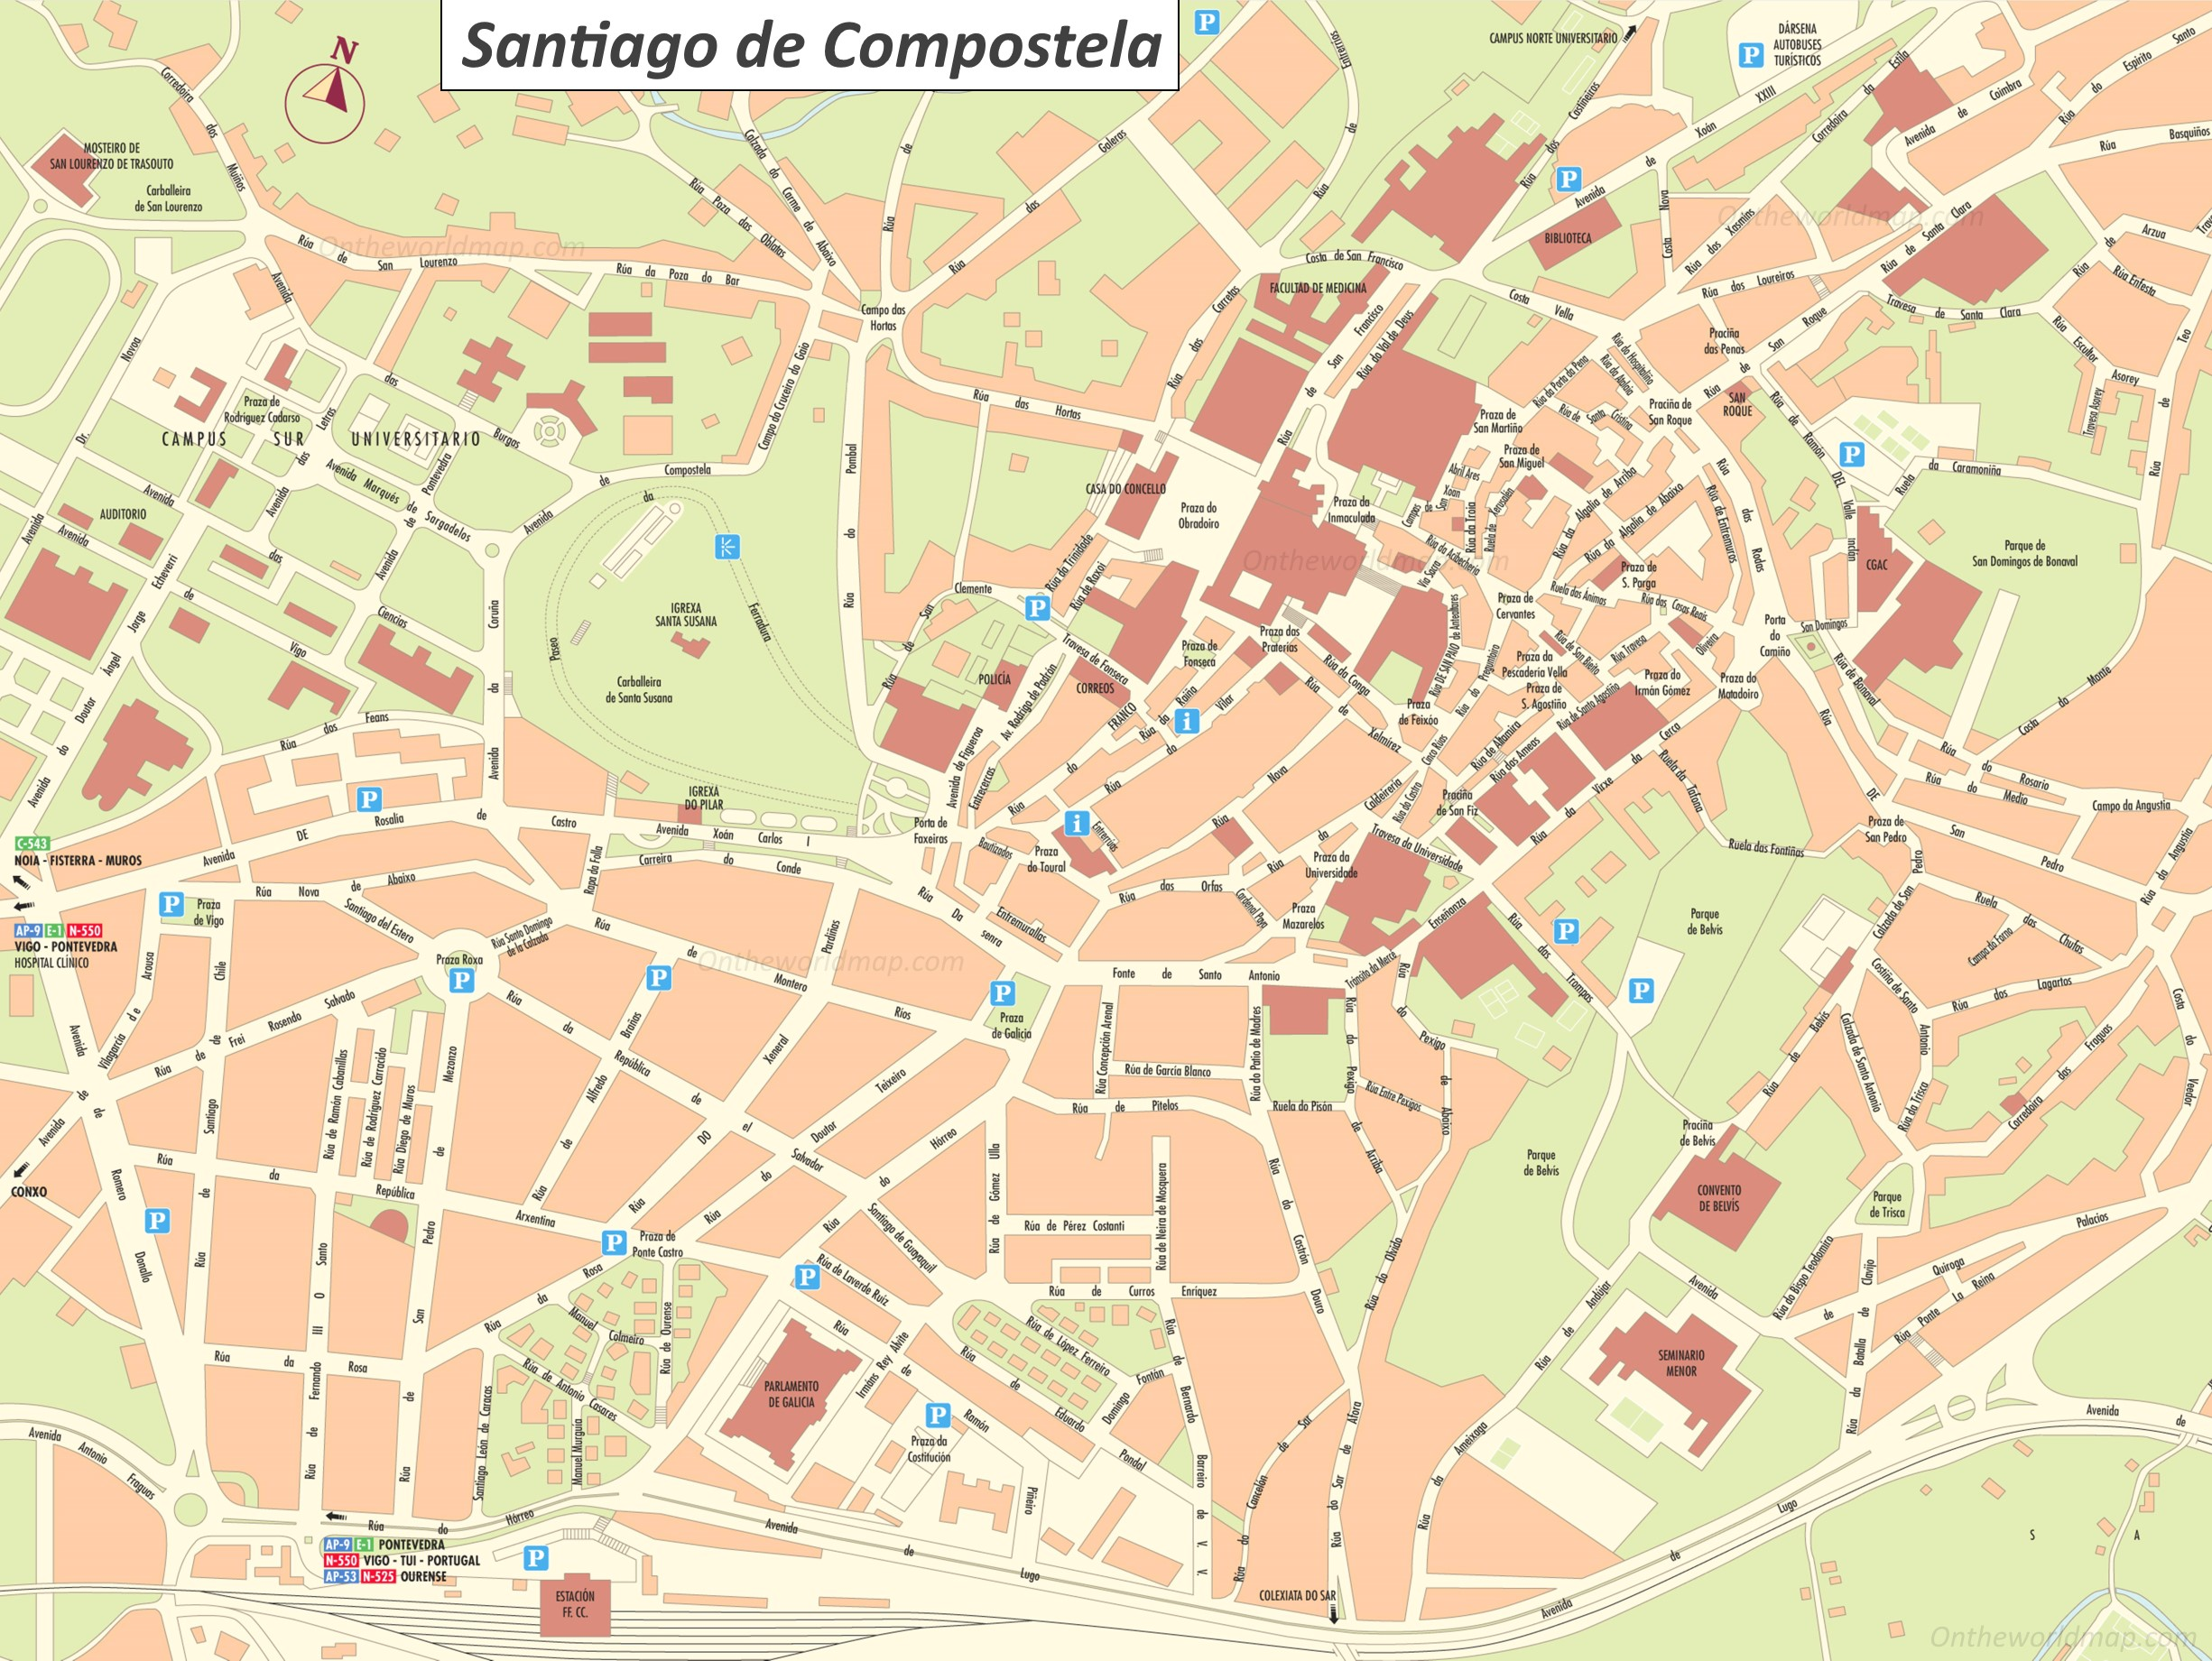 Map santiago de compostela GALICIA GUIDE